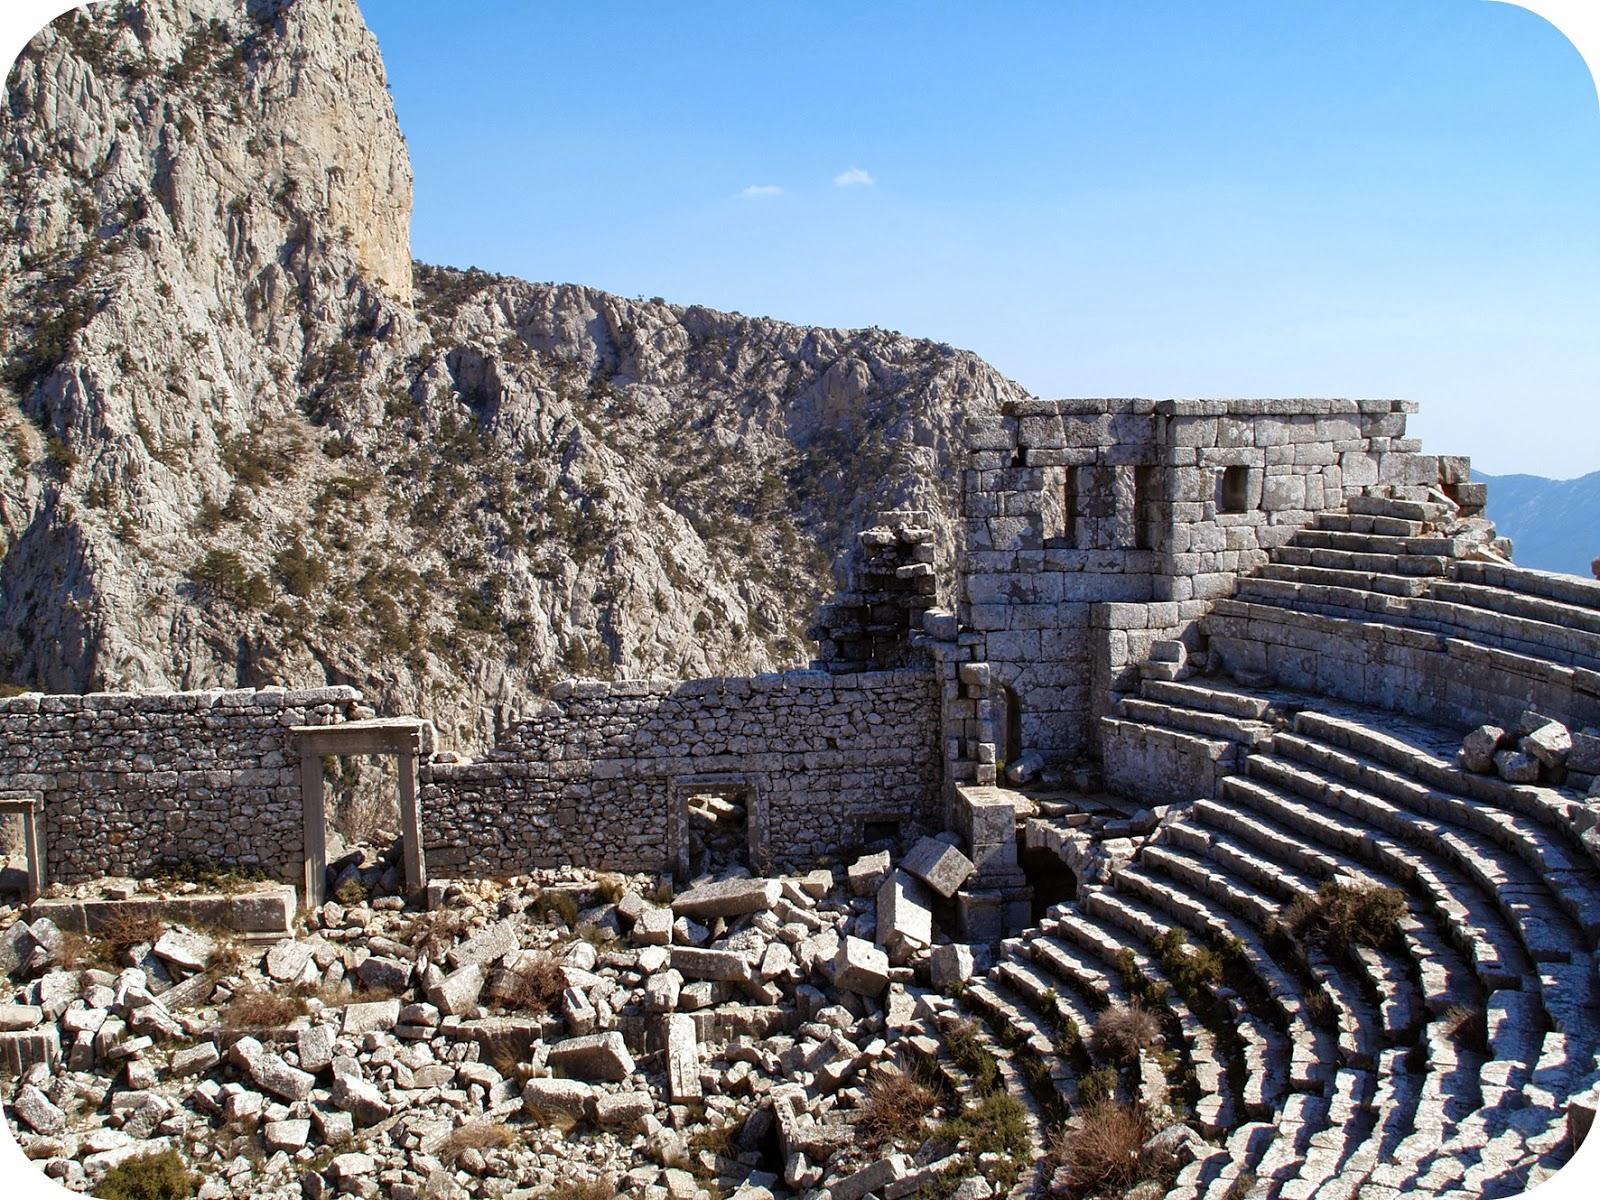 Ruins in Antalya, Turkey